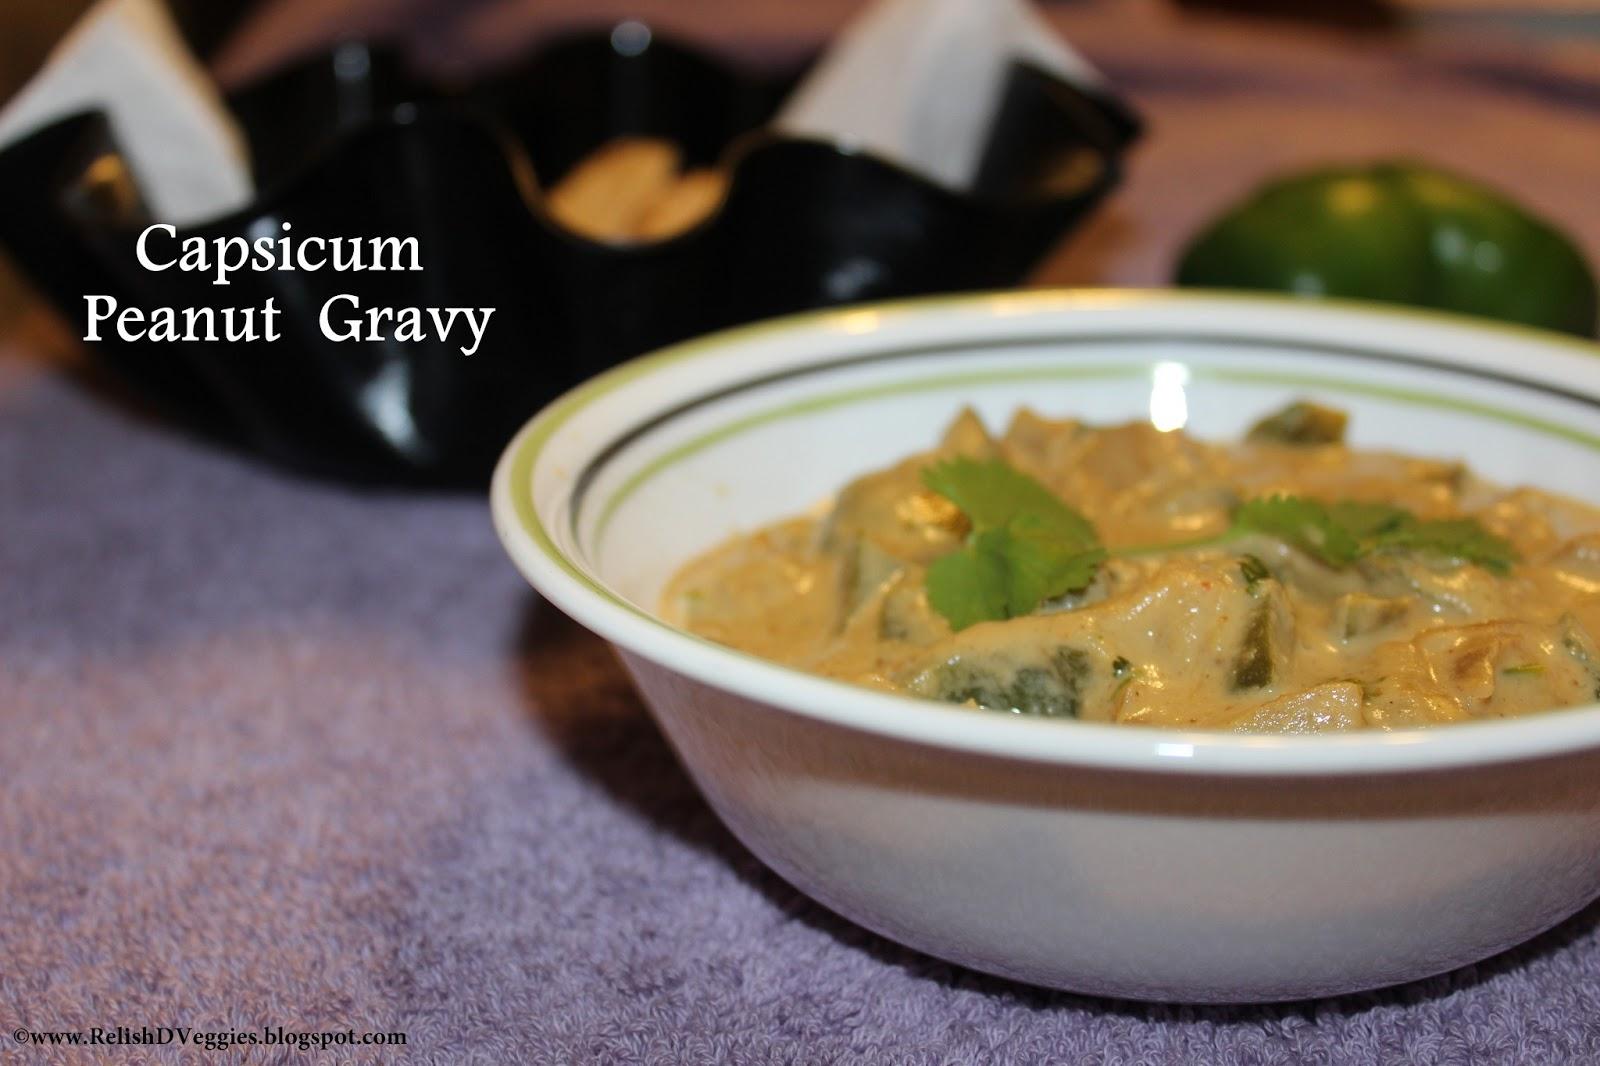 how to make capsicum relish